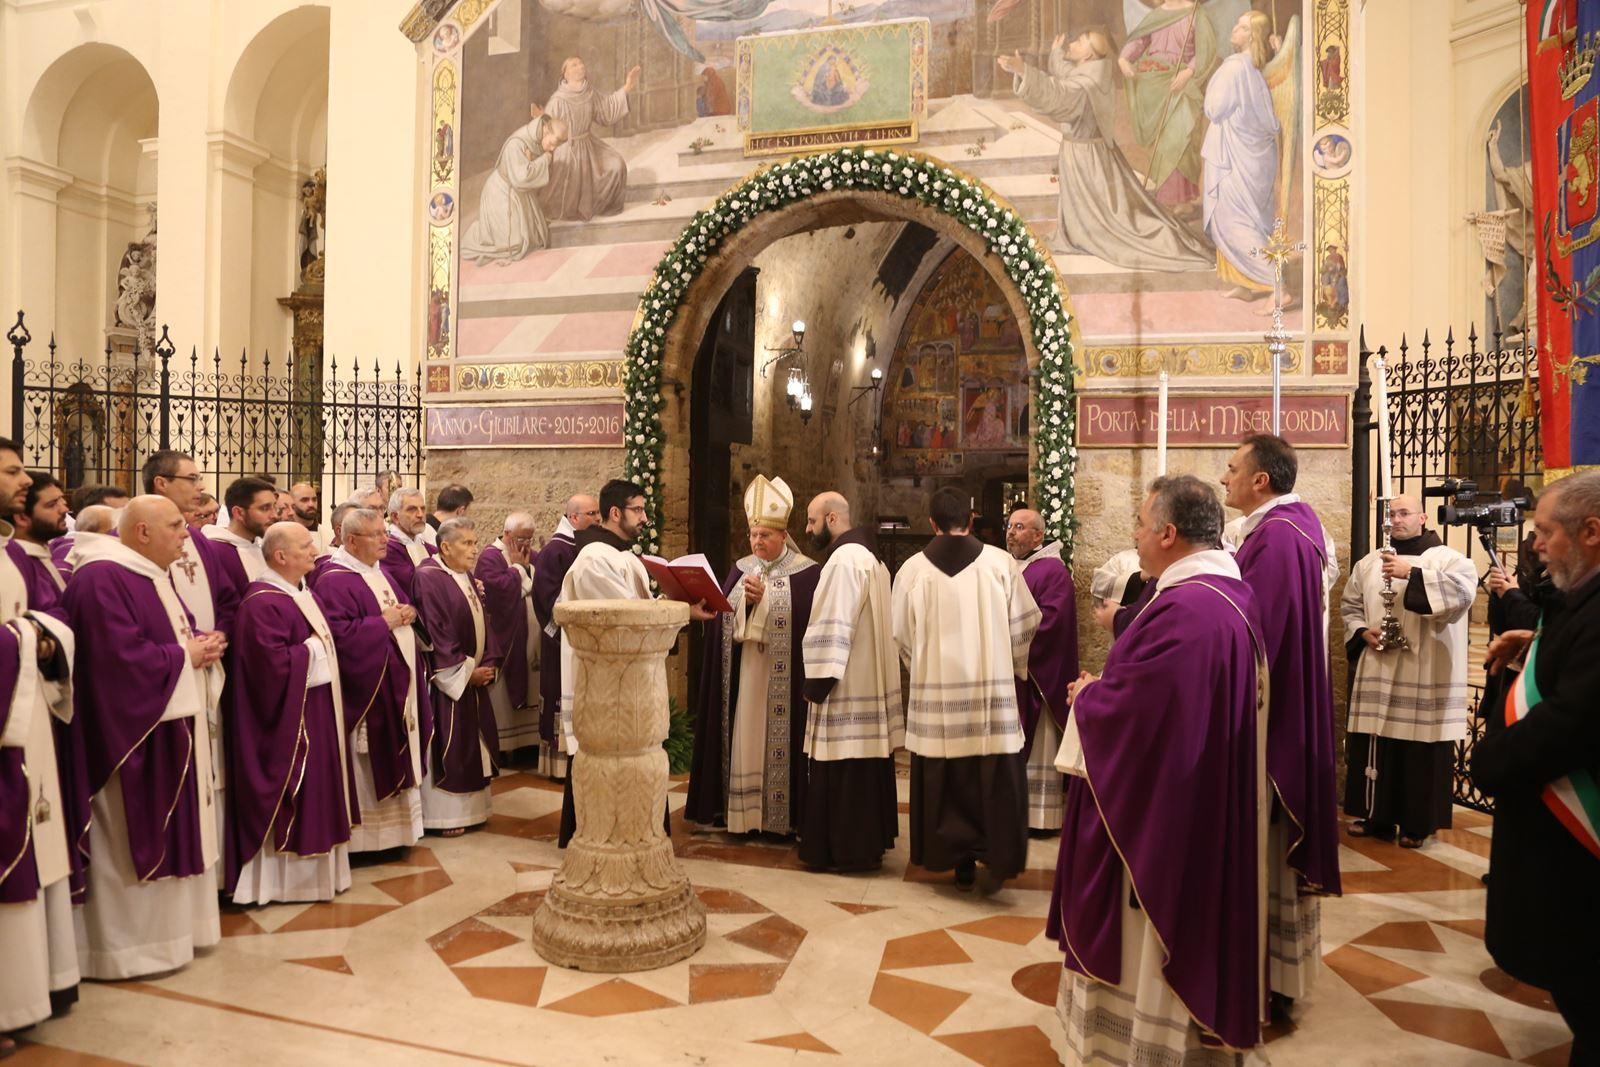 Opening of Holy Door in Assisi's Porziuncola